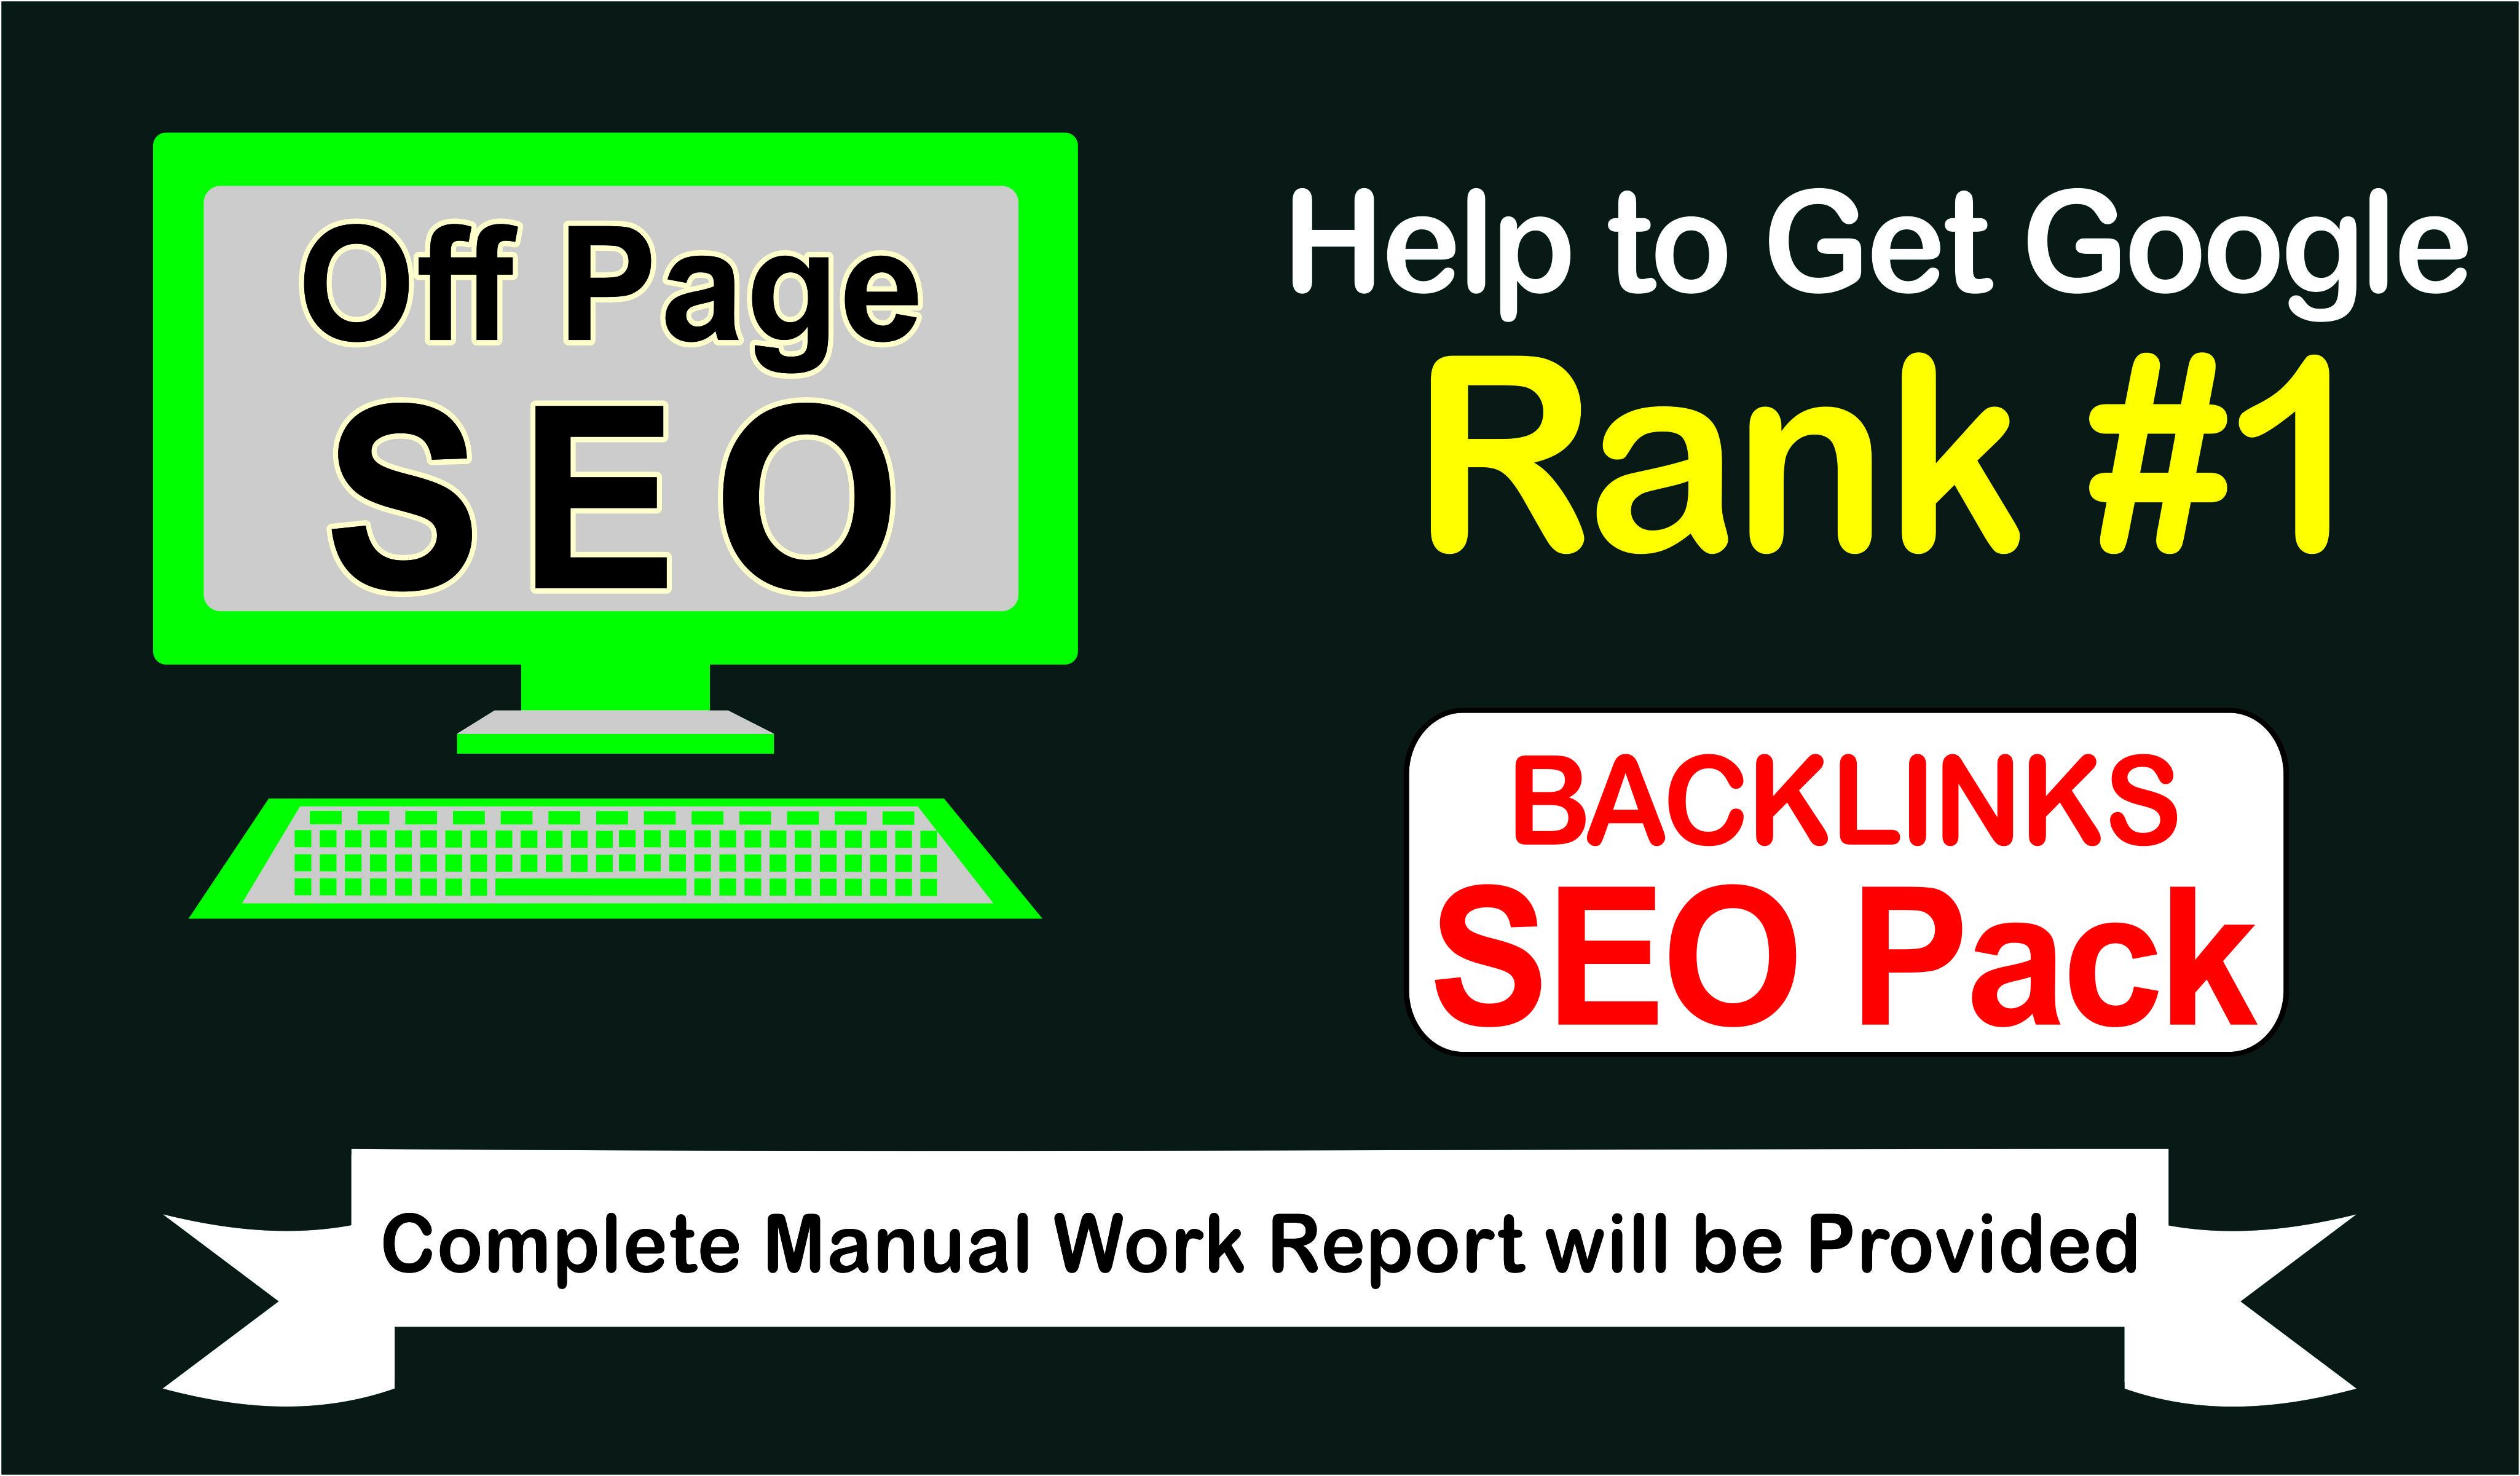 N0. 1 Google Ranking -- SEO Backlink PACK -- trusted links - White hat SEO link plan